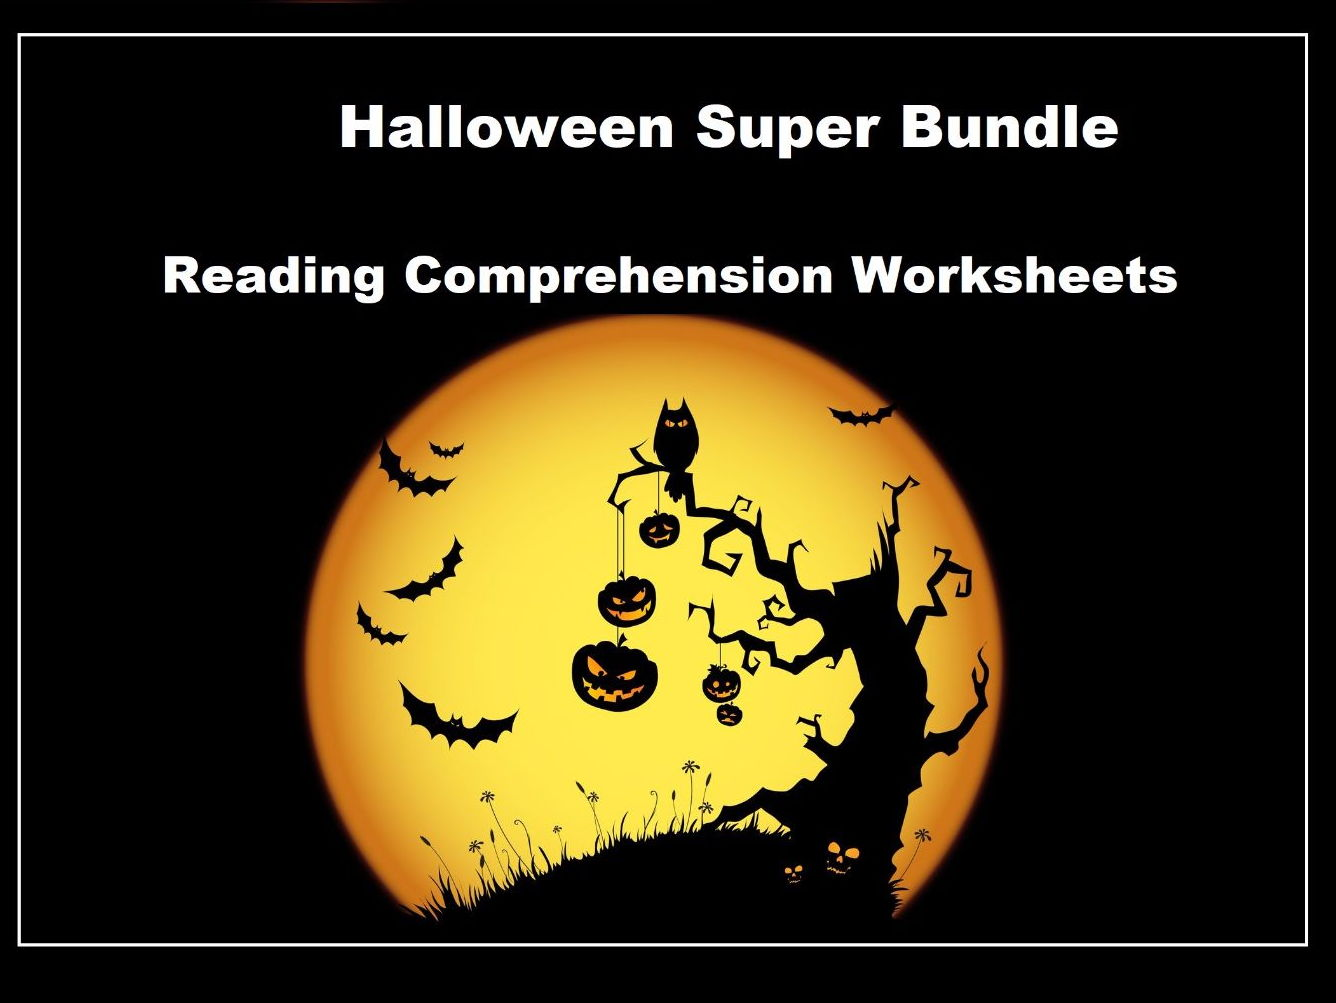 Halloween Reading Comprehension Worksheets